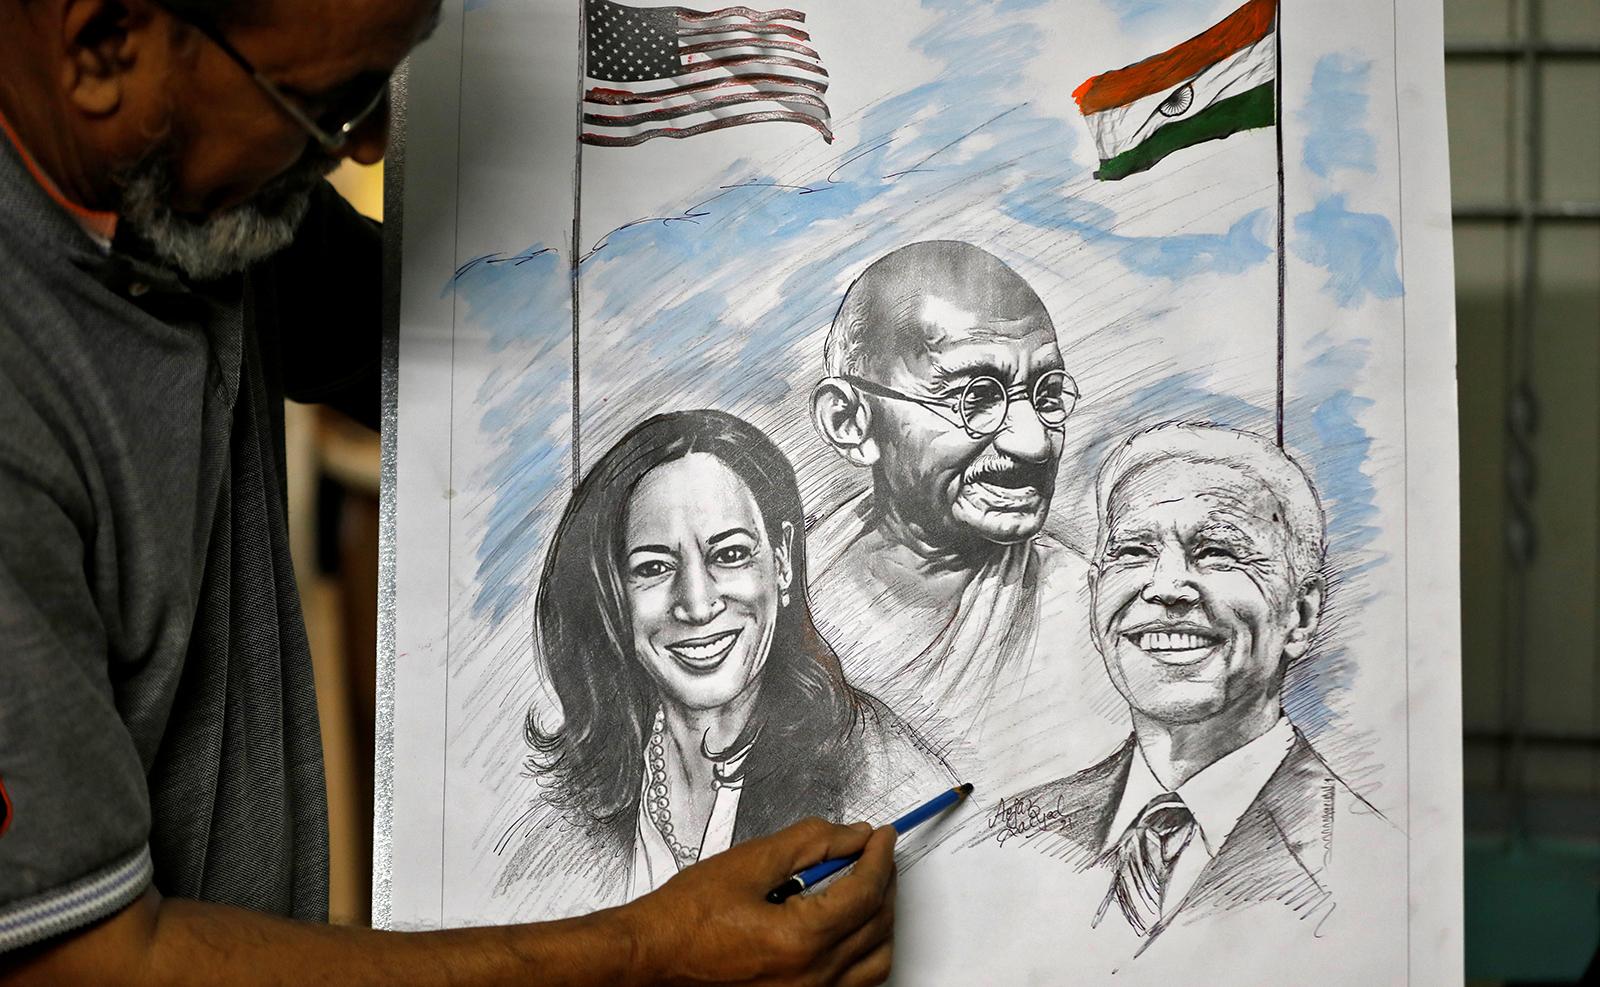 Aejaz Saiyad, an artist, gives finishing touches to a drawing of U.S. President-elect Joe Biden, Vice President-elect Kamala Harris and India's independence hero Mahatma Gandhi at his home in Ahmedabad, India, January 20, 2021. REUTERS